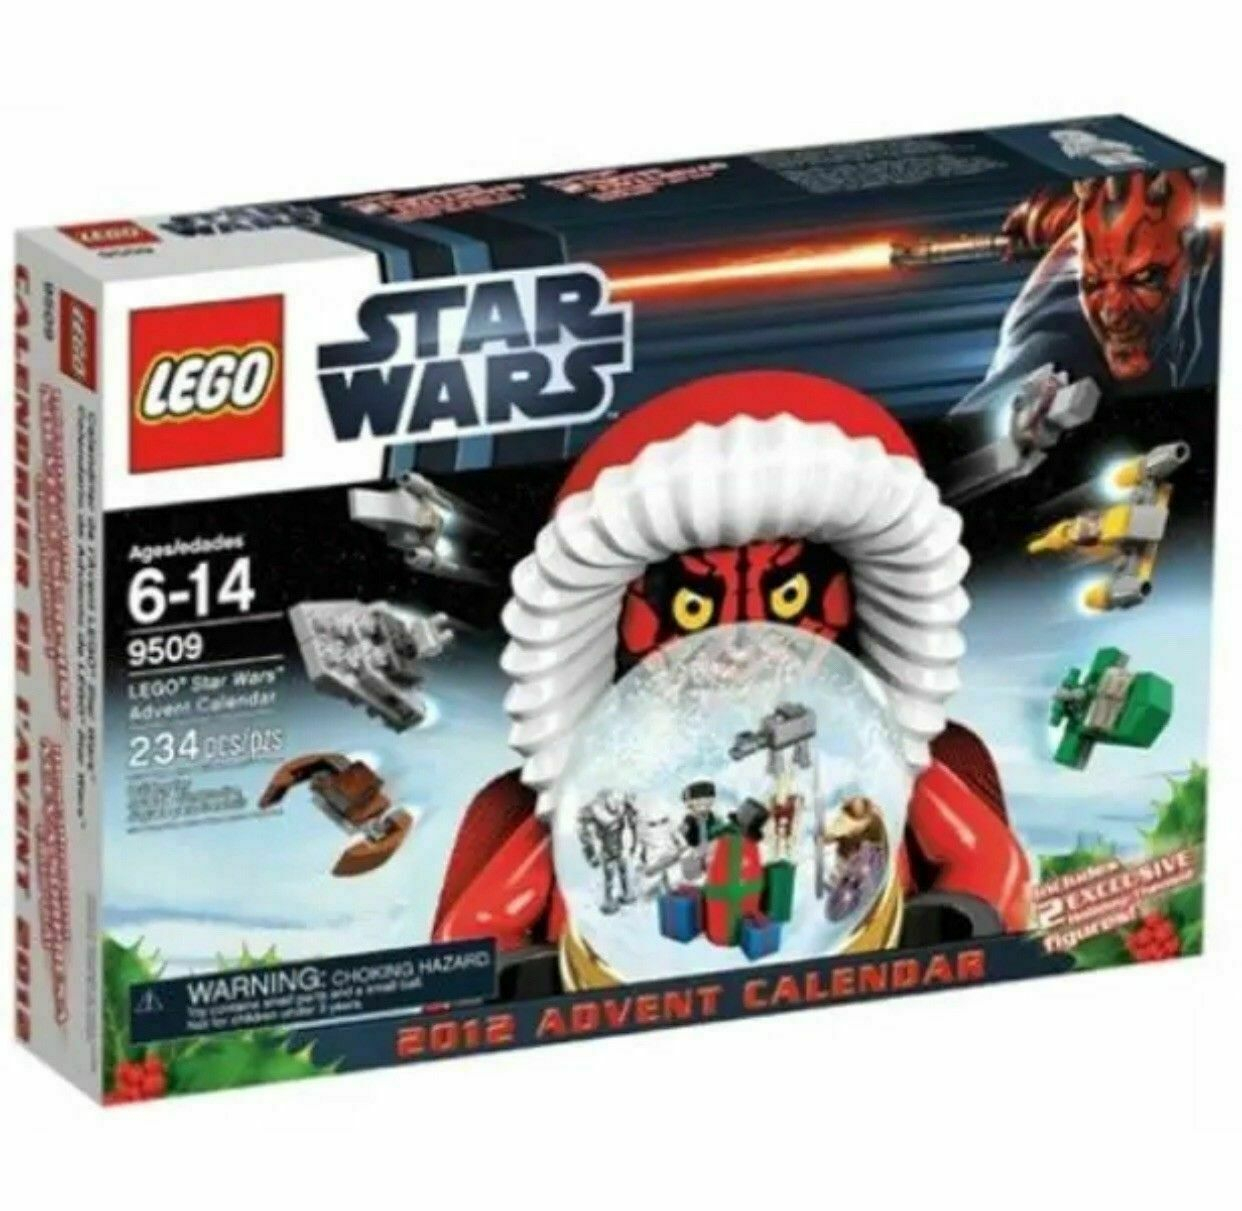 Lego Star Wars 2012 Advent Calendar (9509) with regard to Lego Star Wars Advent Calendar 2011 Instructions